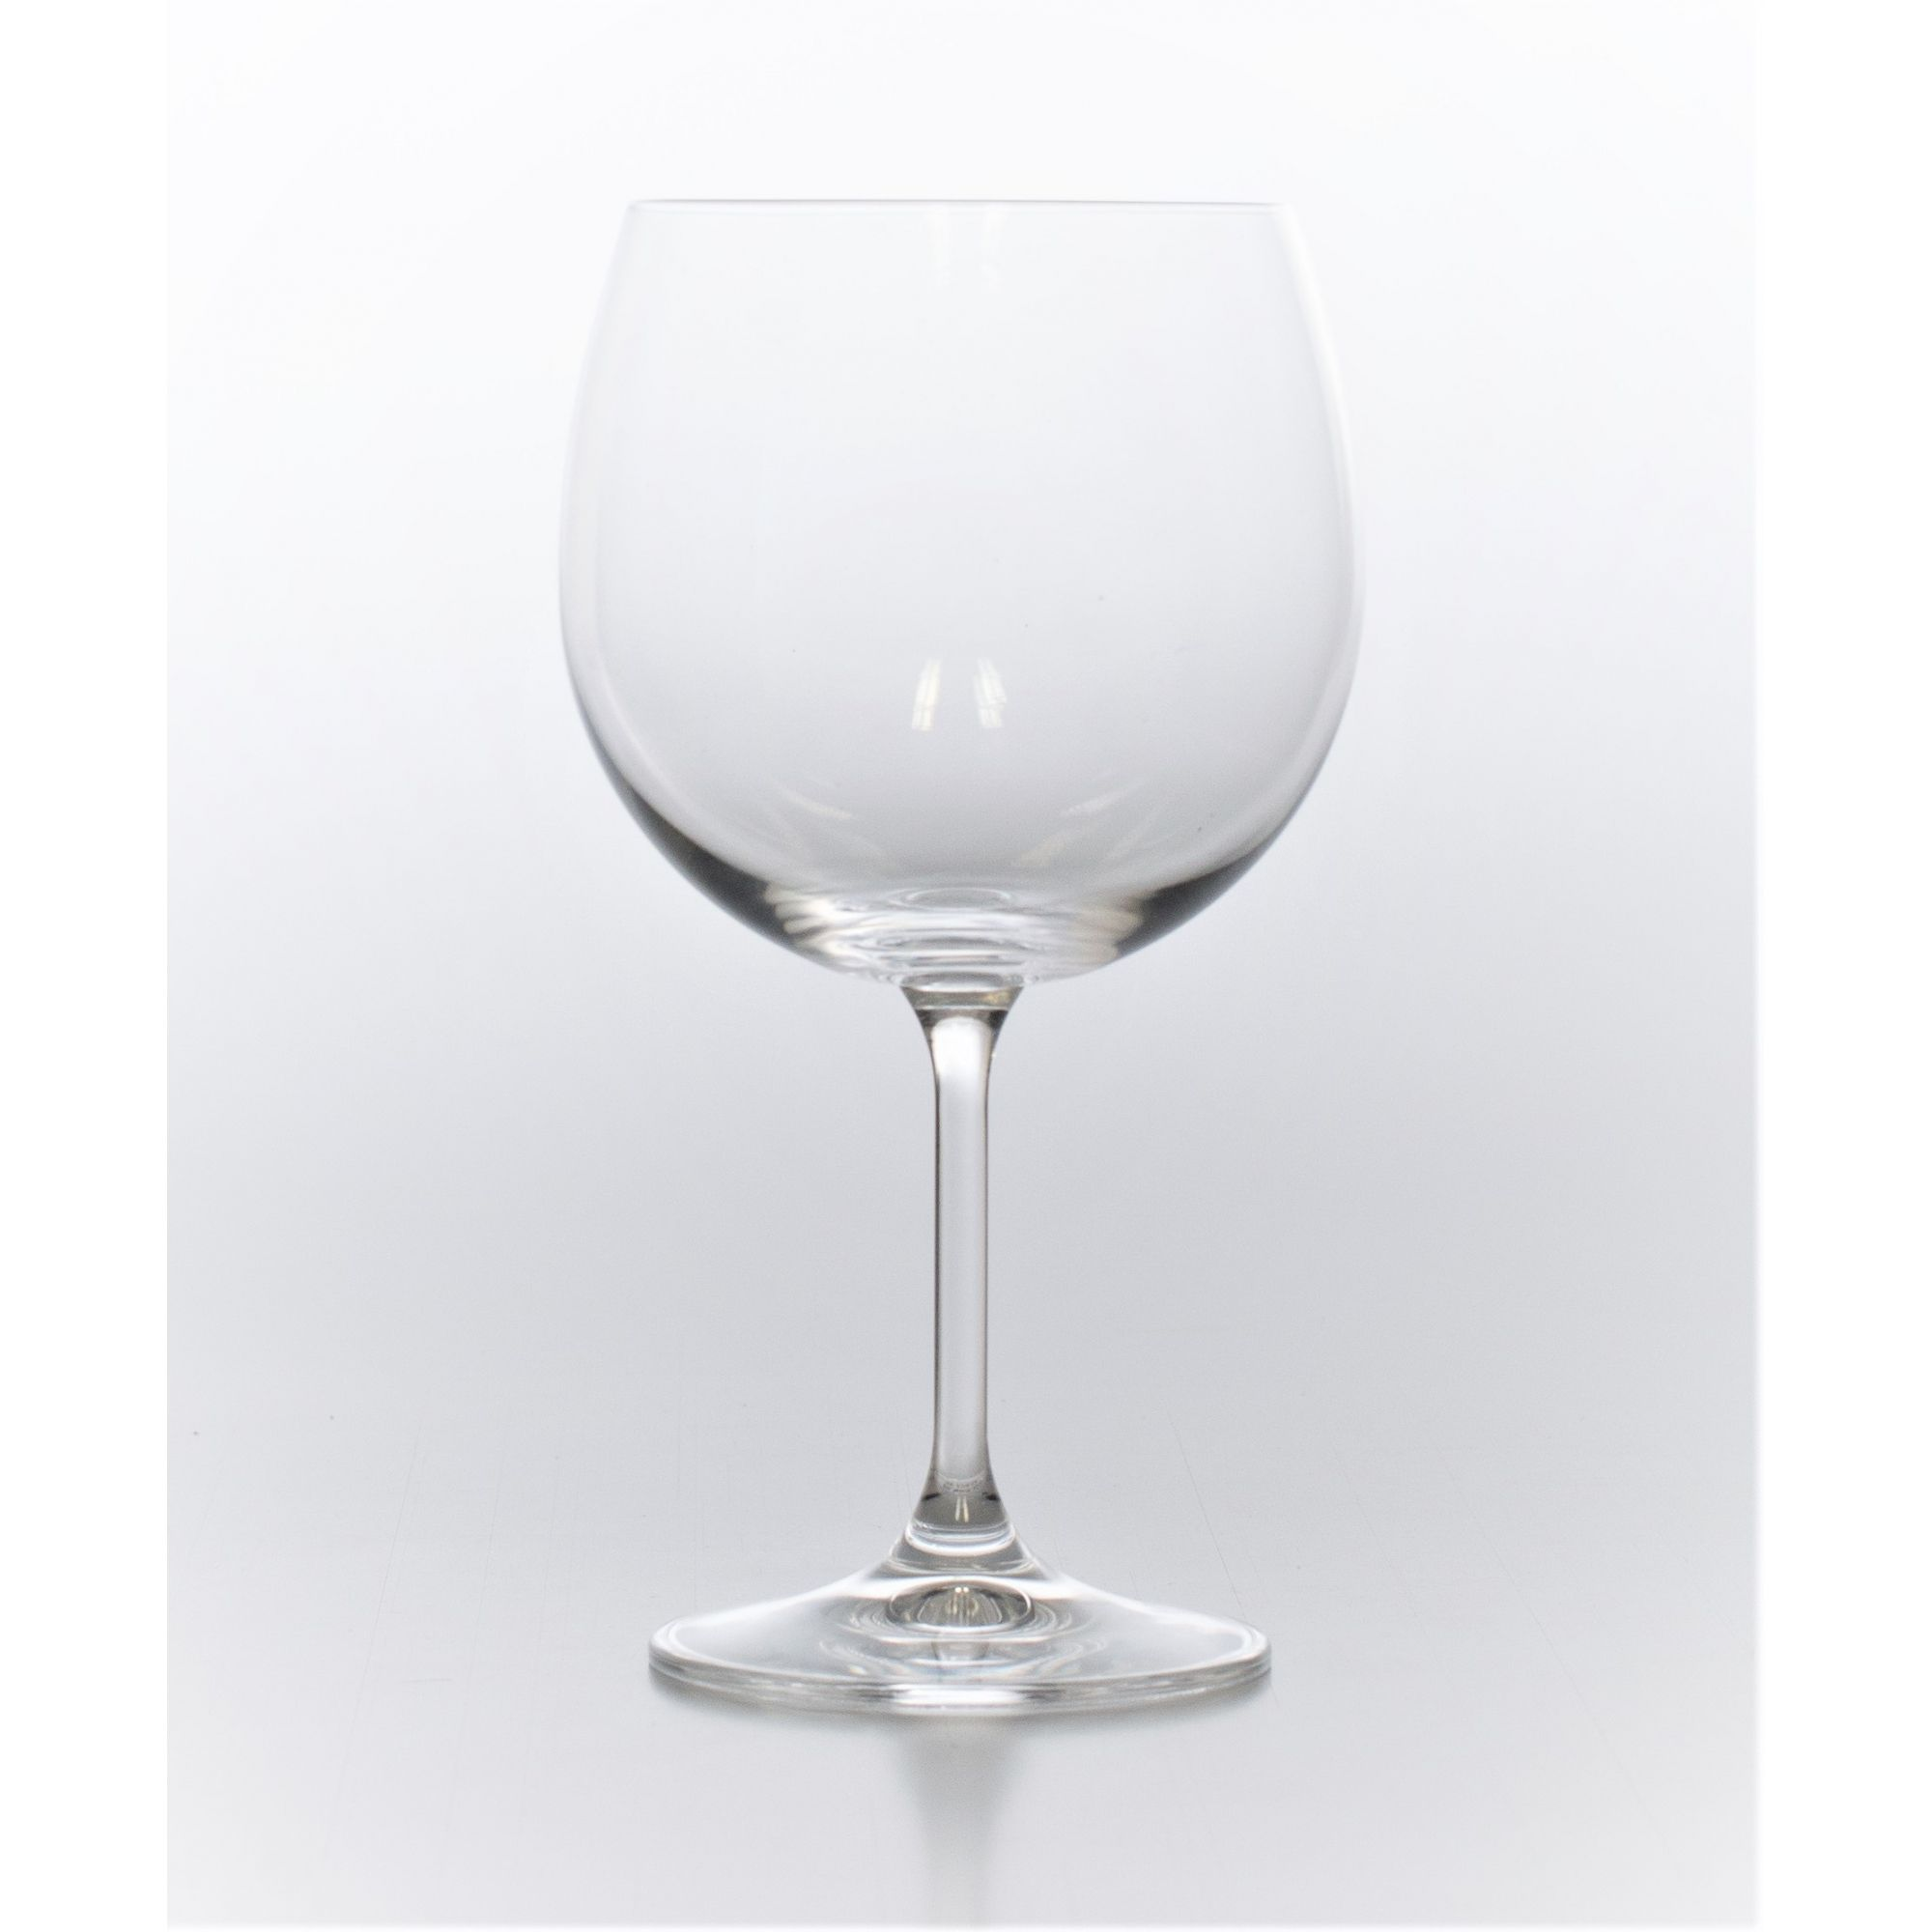 Conjunto 6 Taças Roberta Cristal Bohemia Titanium Inside 600ml - Gastro para Gin